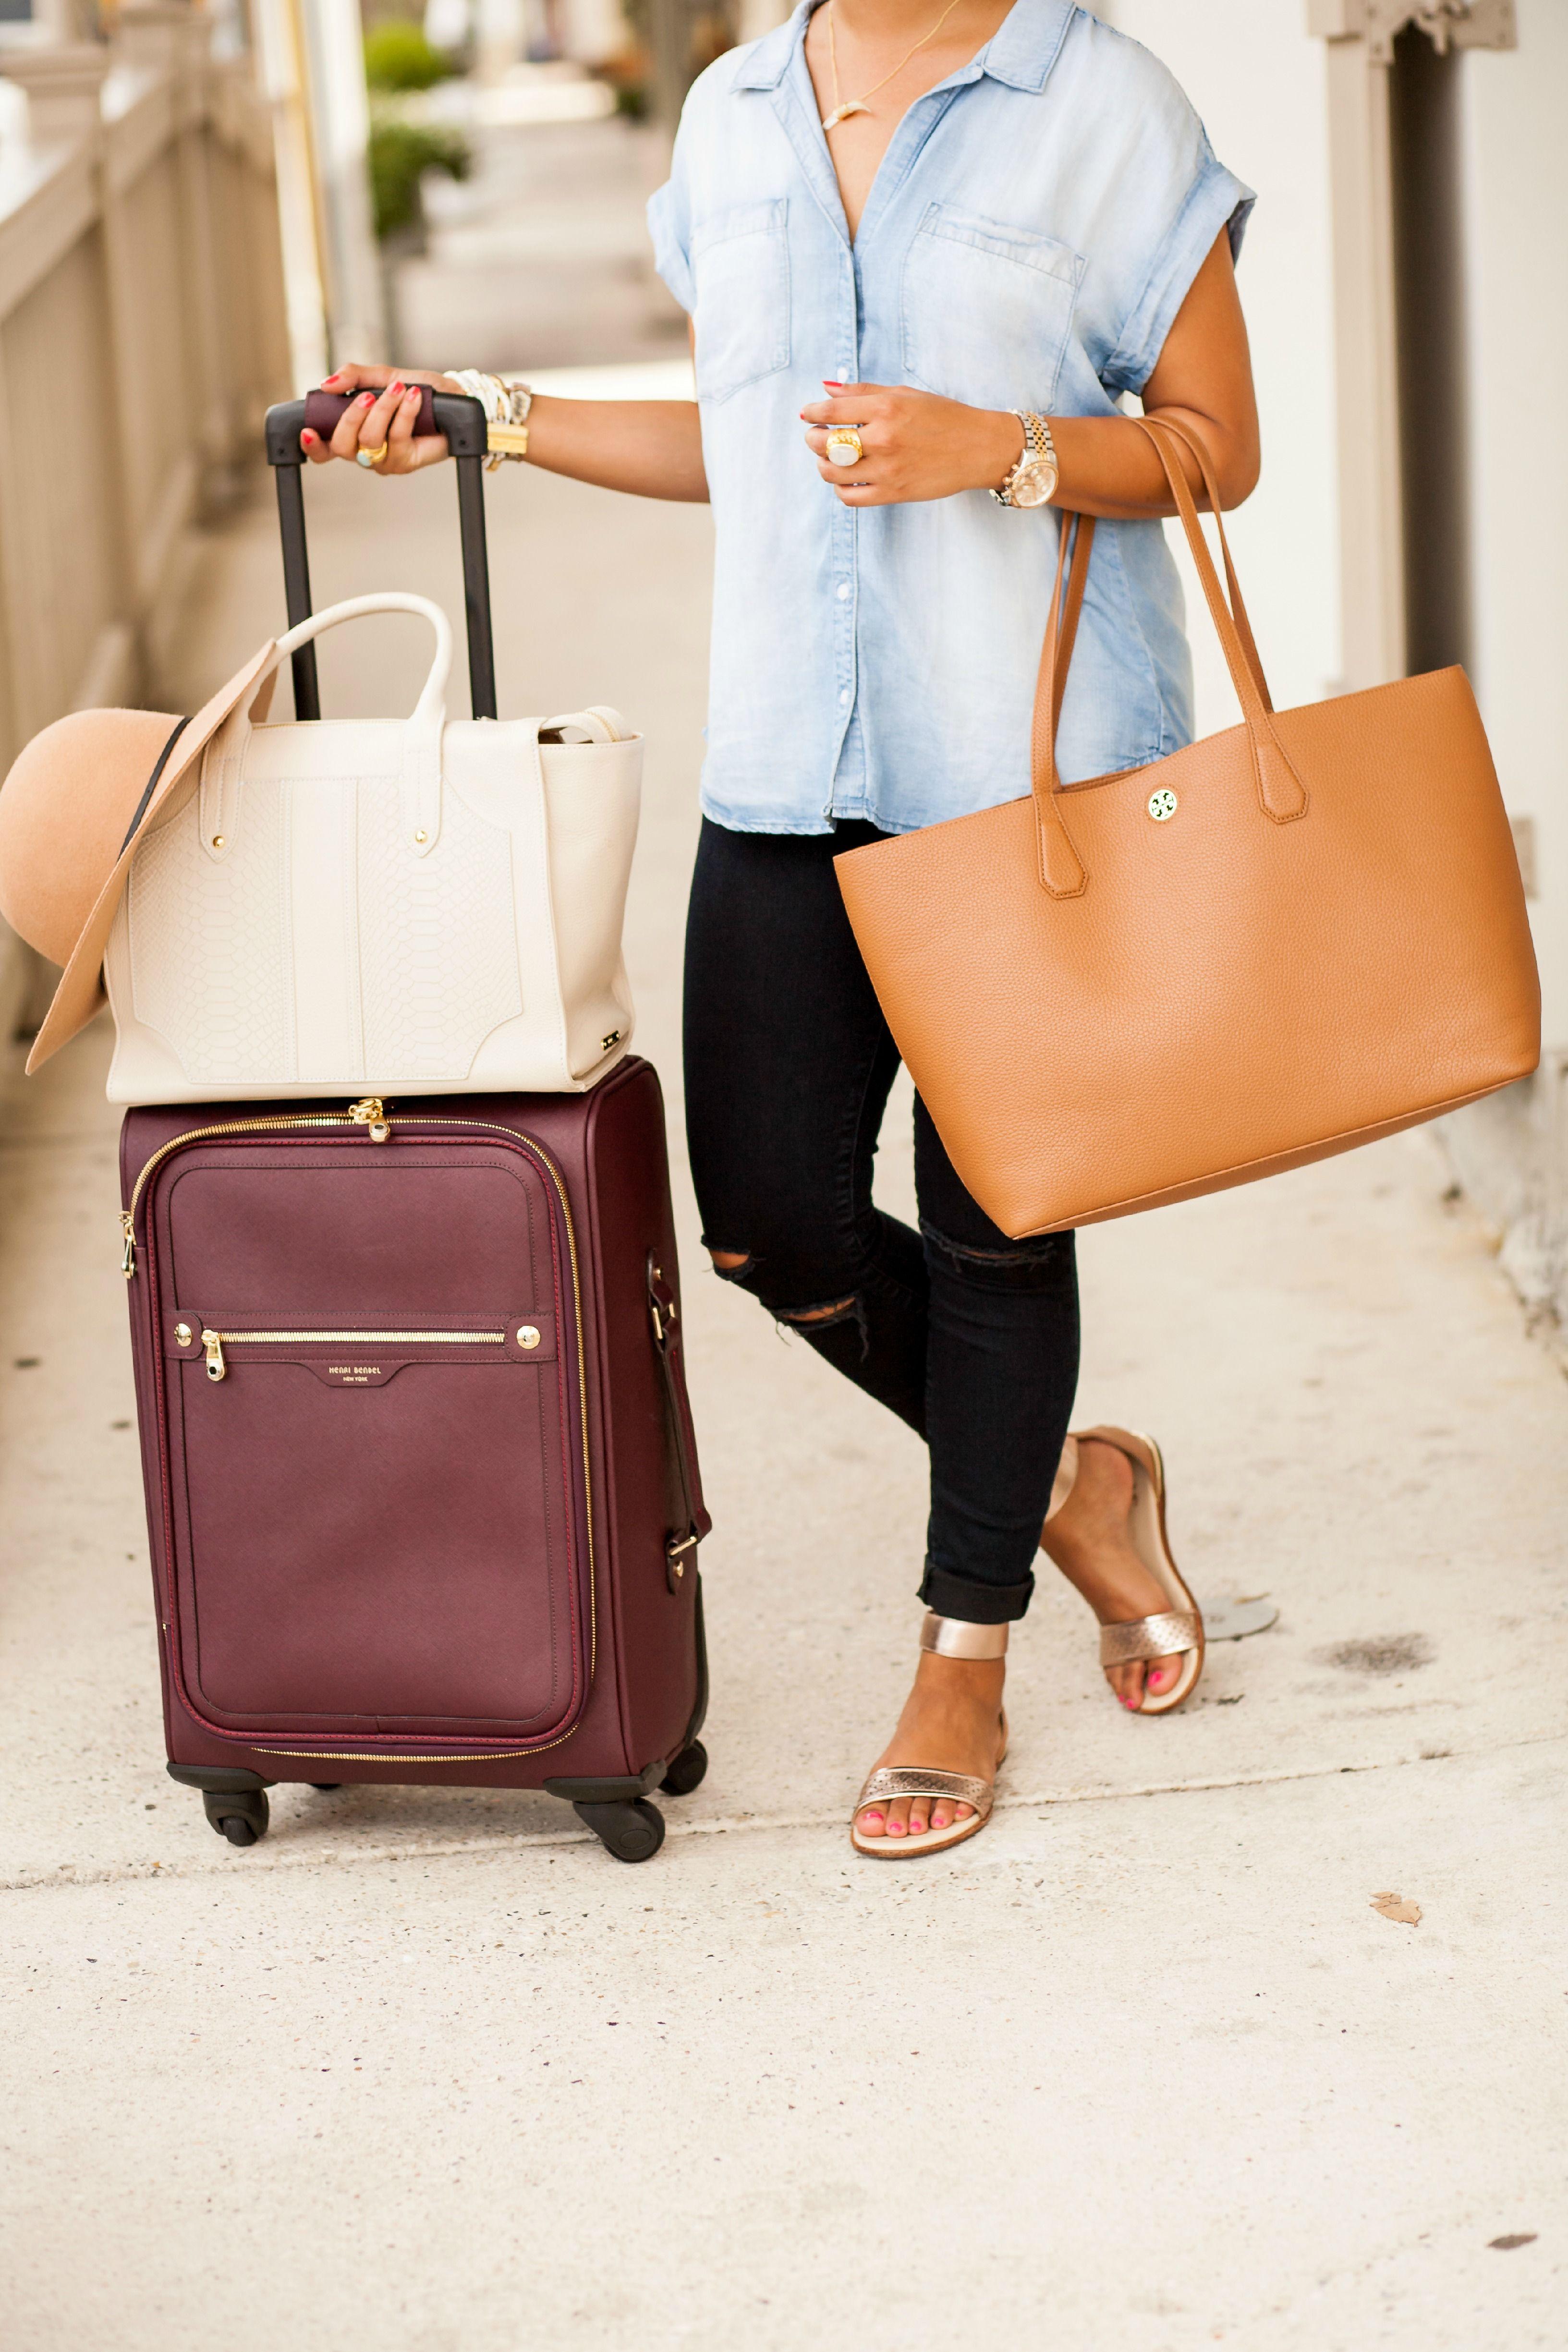 5d916314bbf8 New York Fashion Week Packing